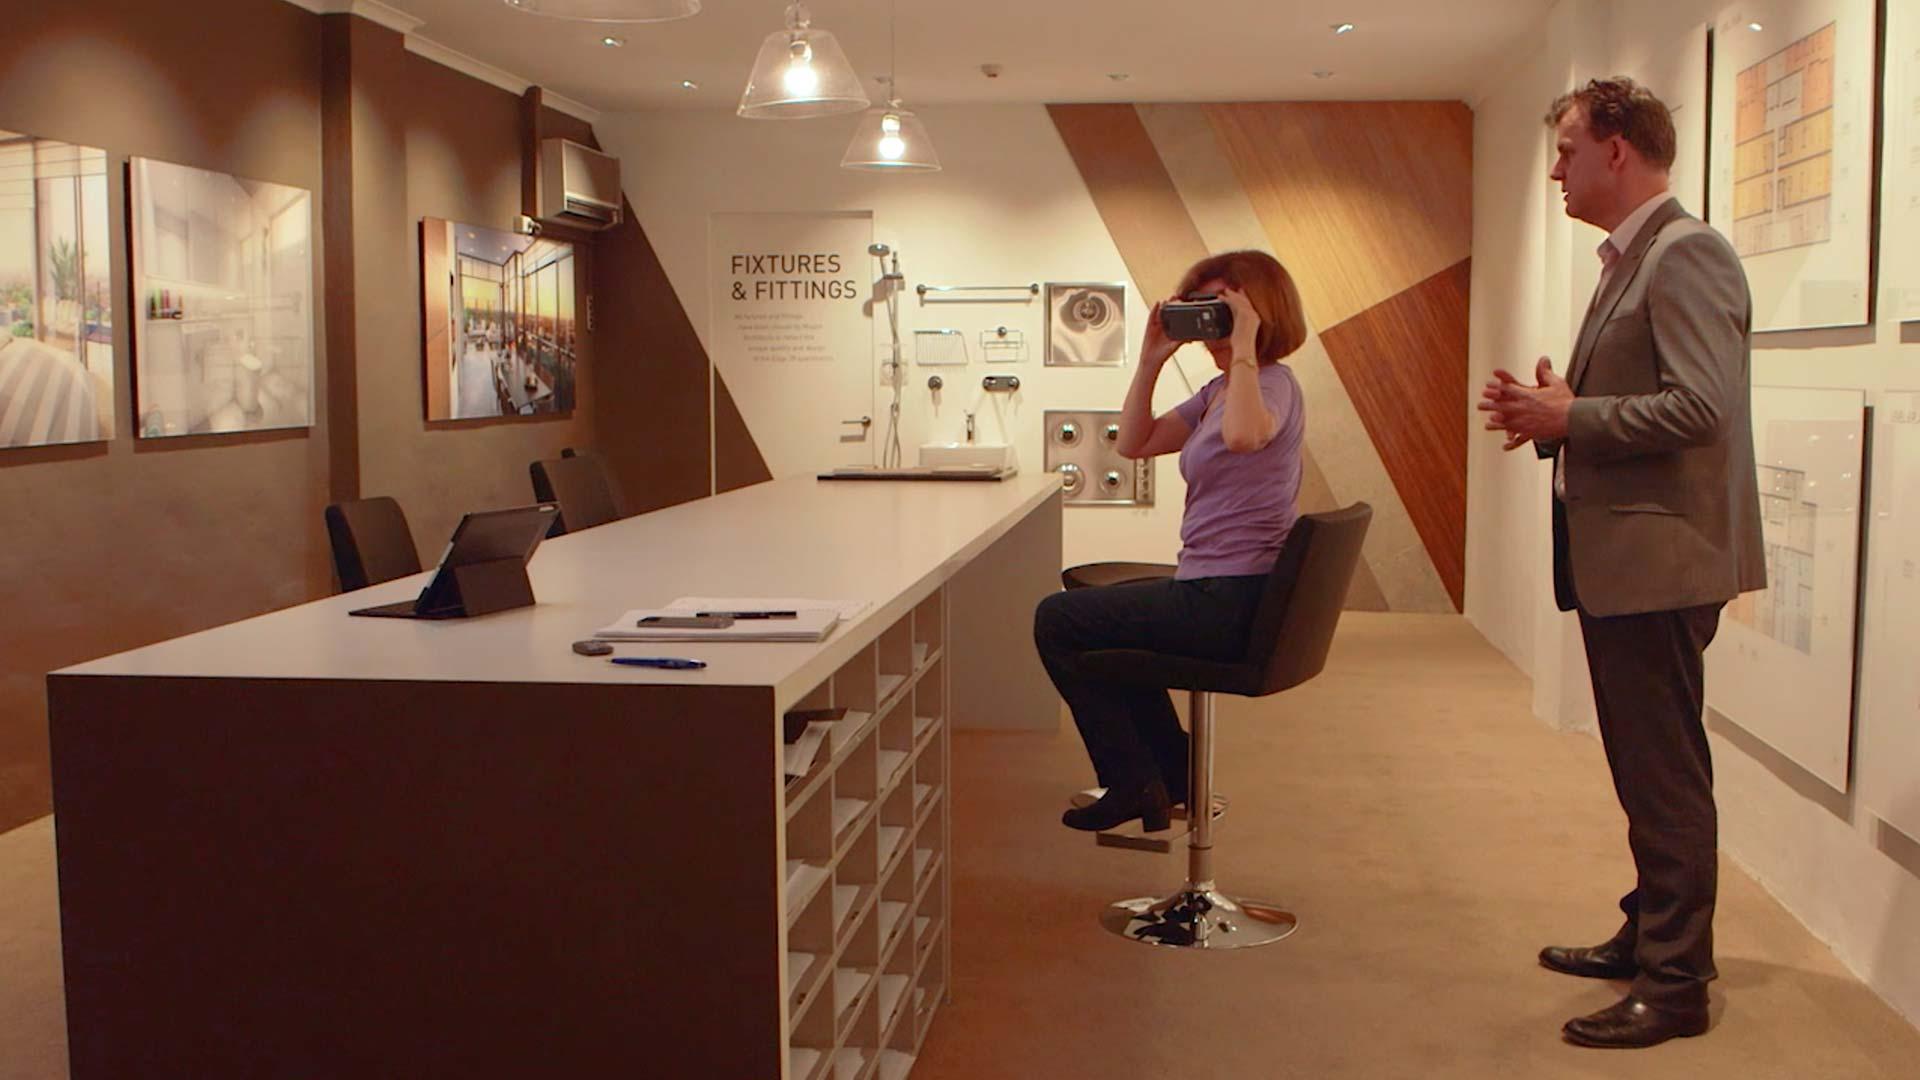 Real Estate VR Image by Start Beyond 01